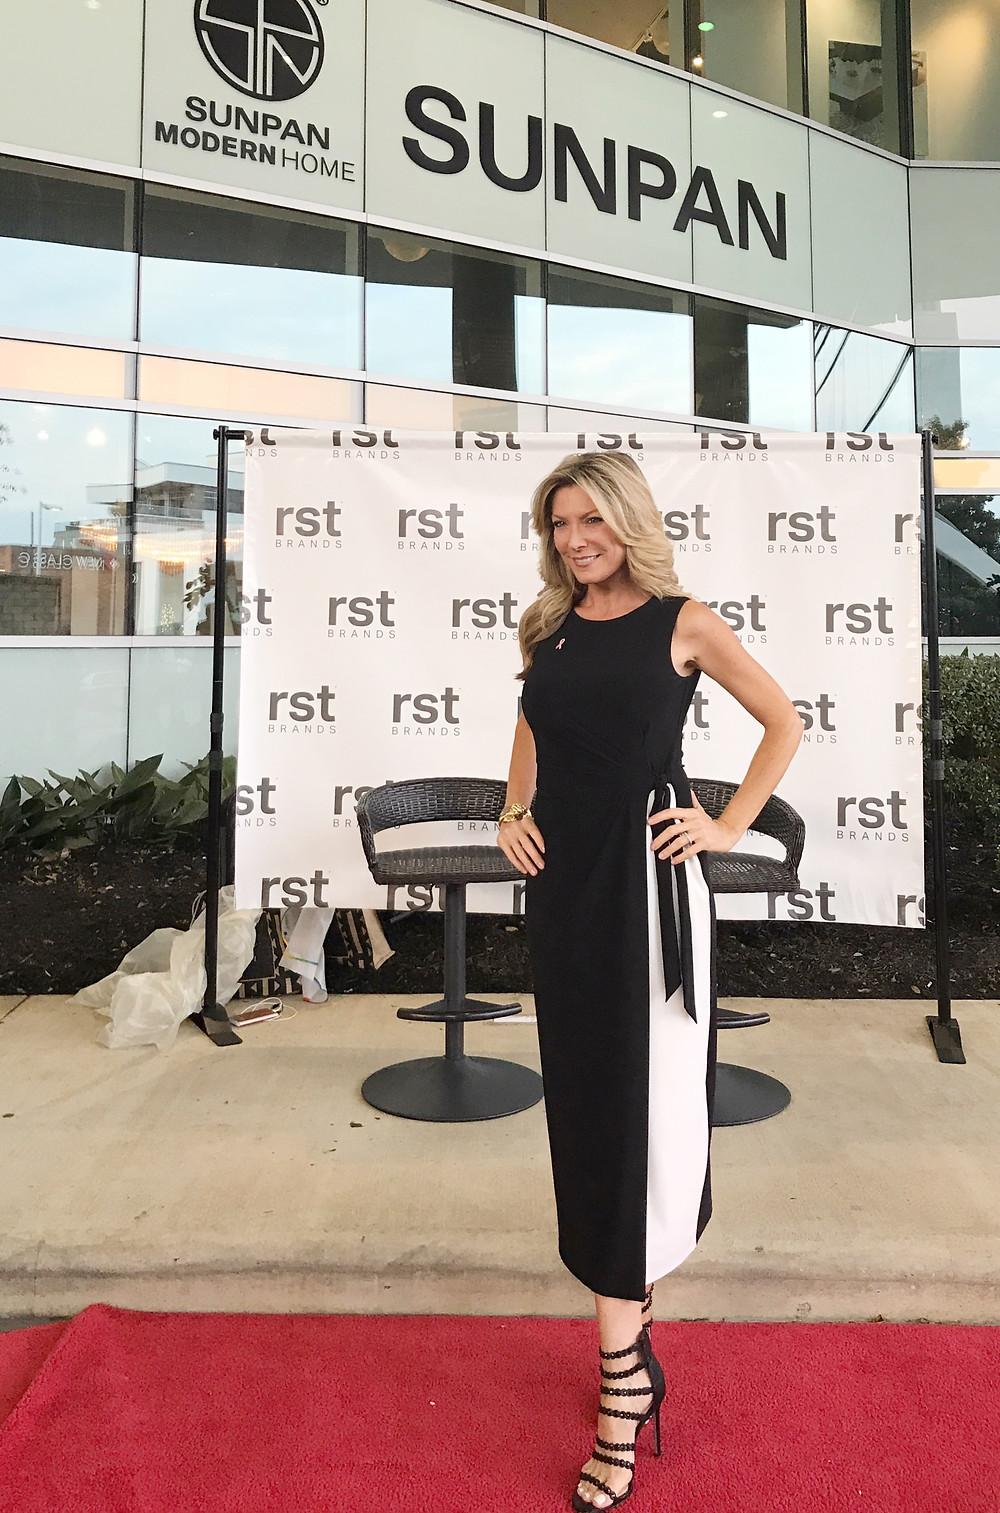 Jennifer Farrell A&E's Behind The Gates